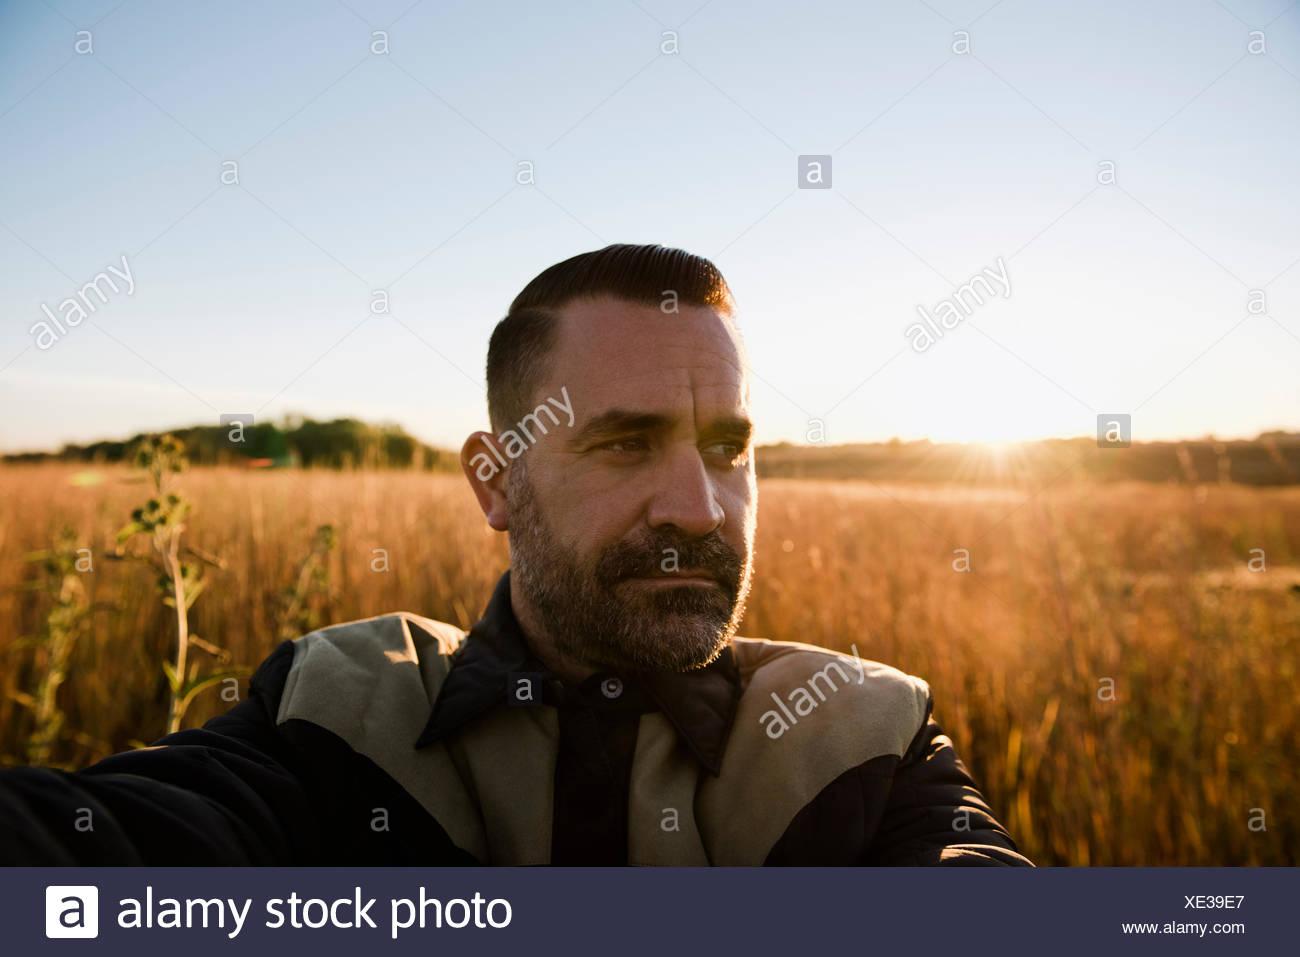 Self portrait of farmer in wheat field at sunset, Plattsburg, Missouri, USA - Stock Image